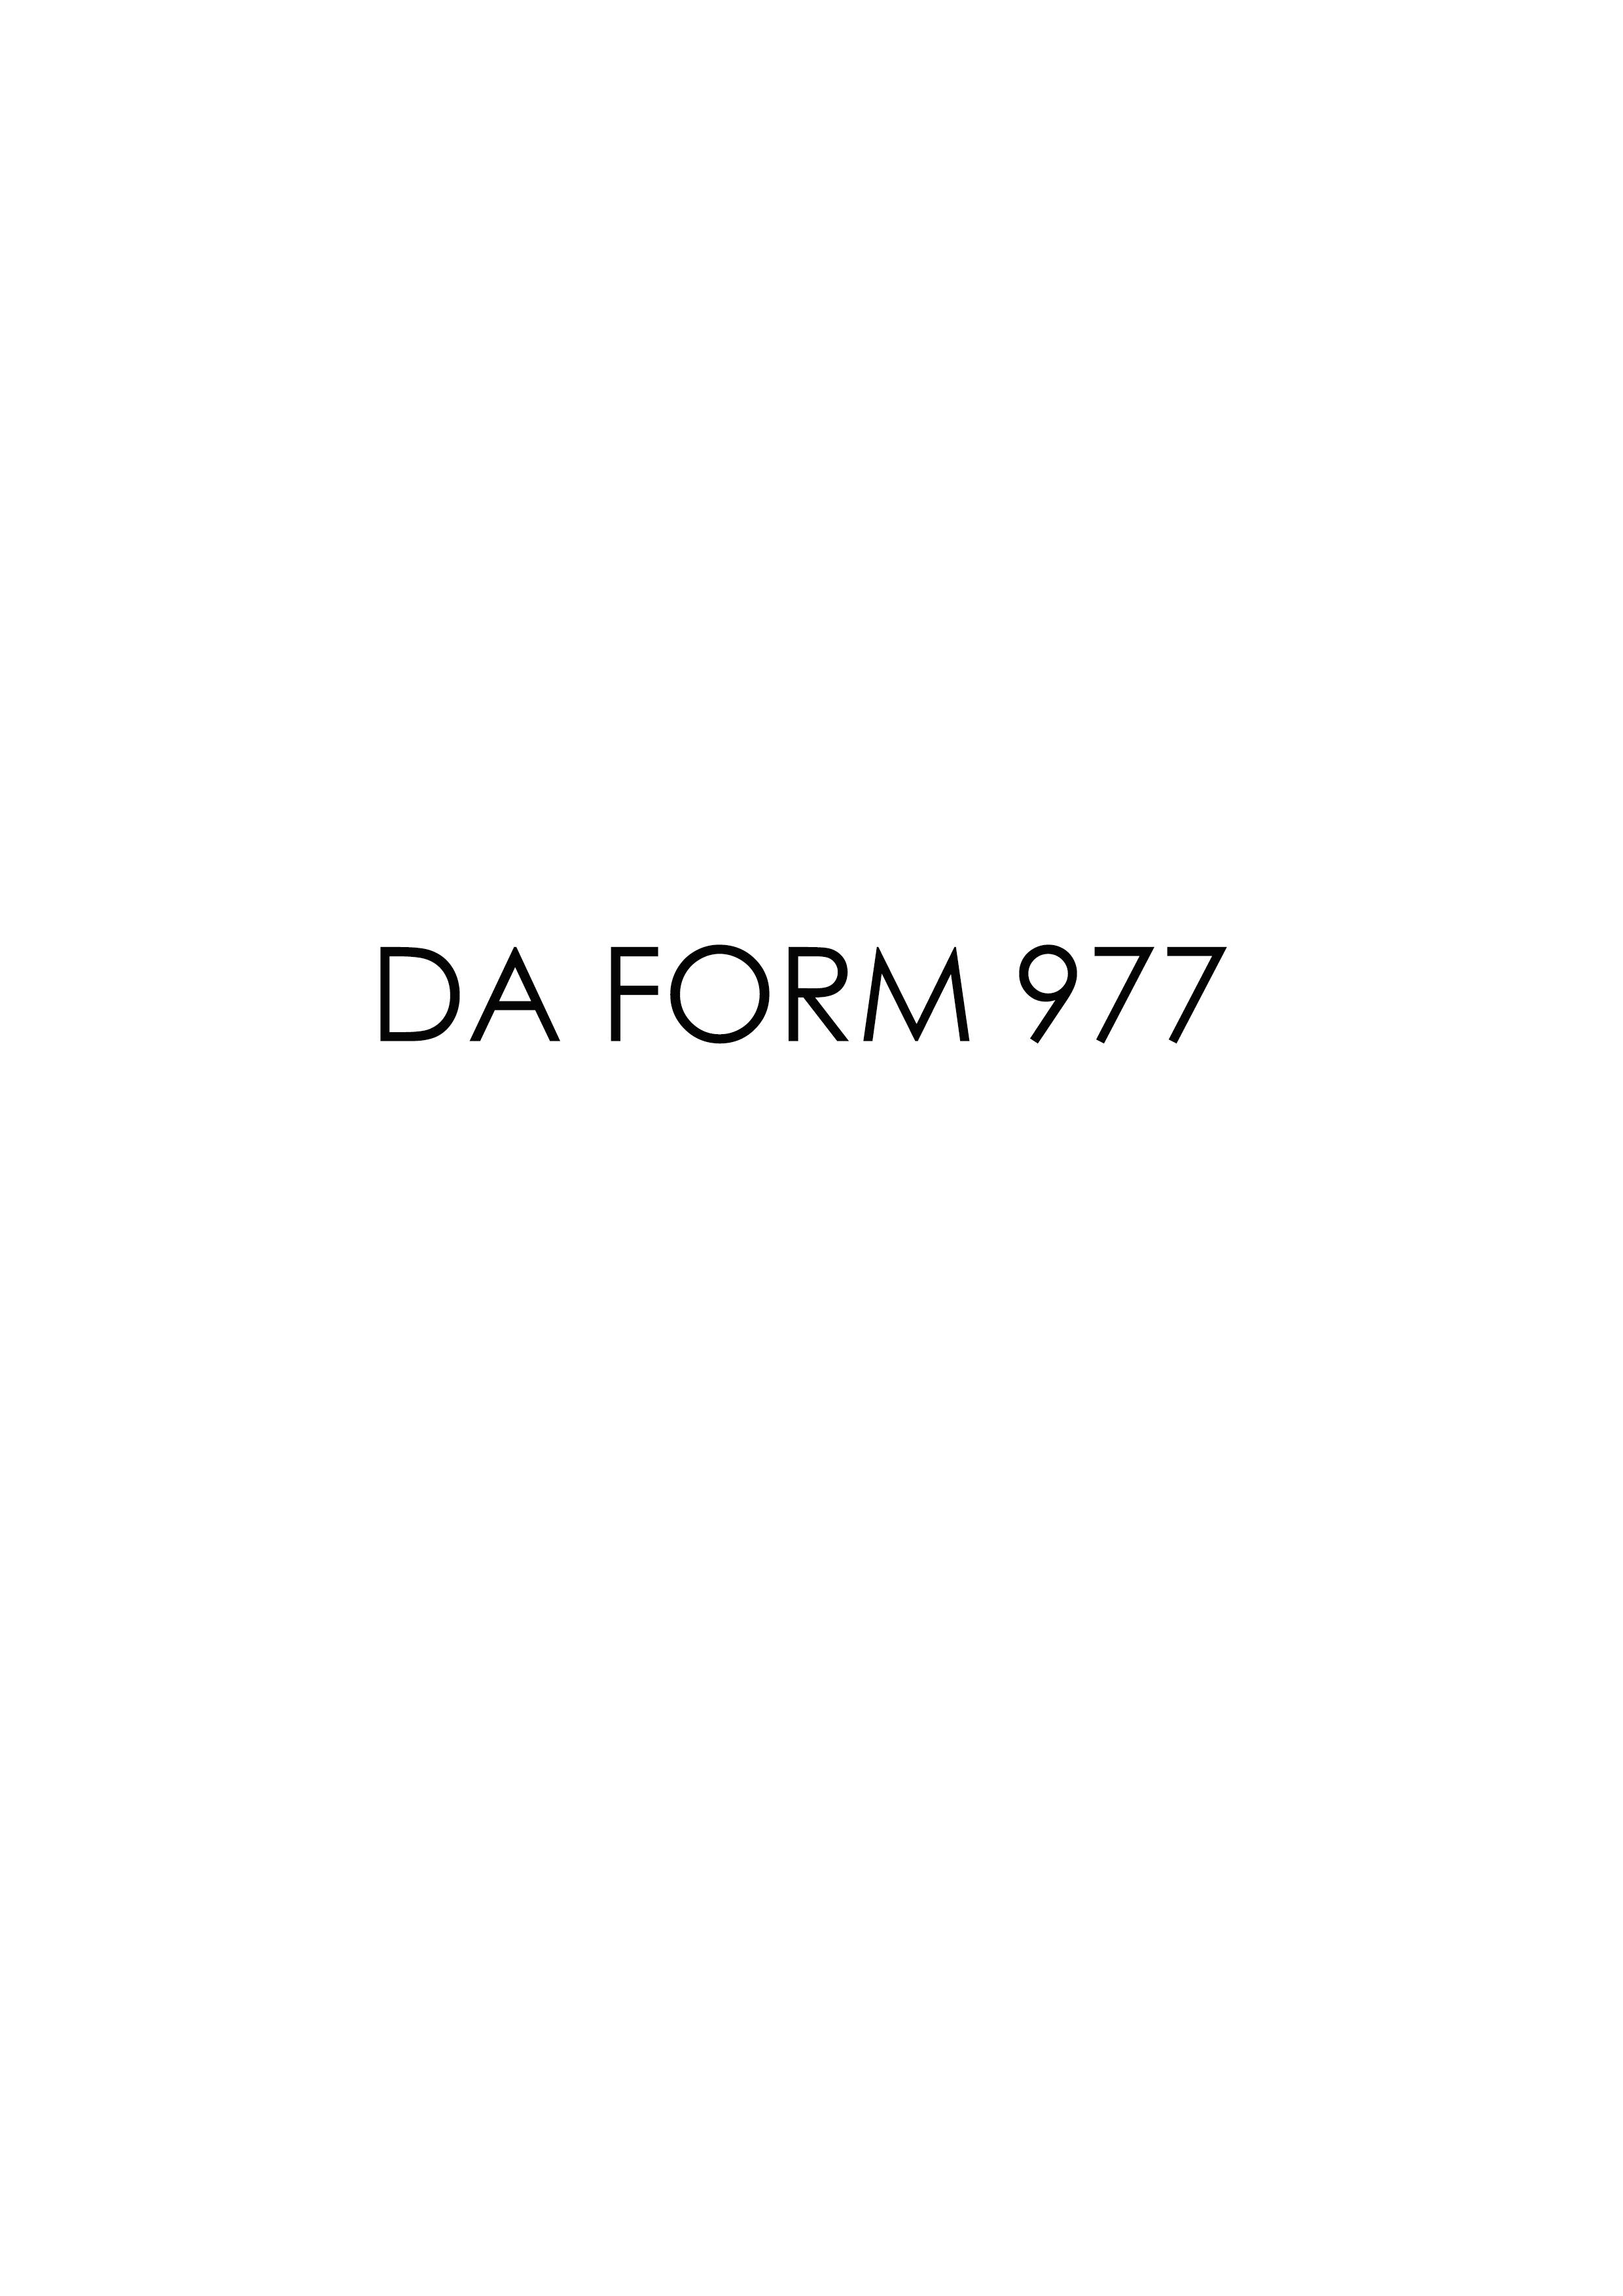 Download da Form 977 Free